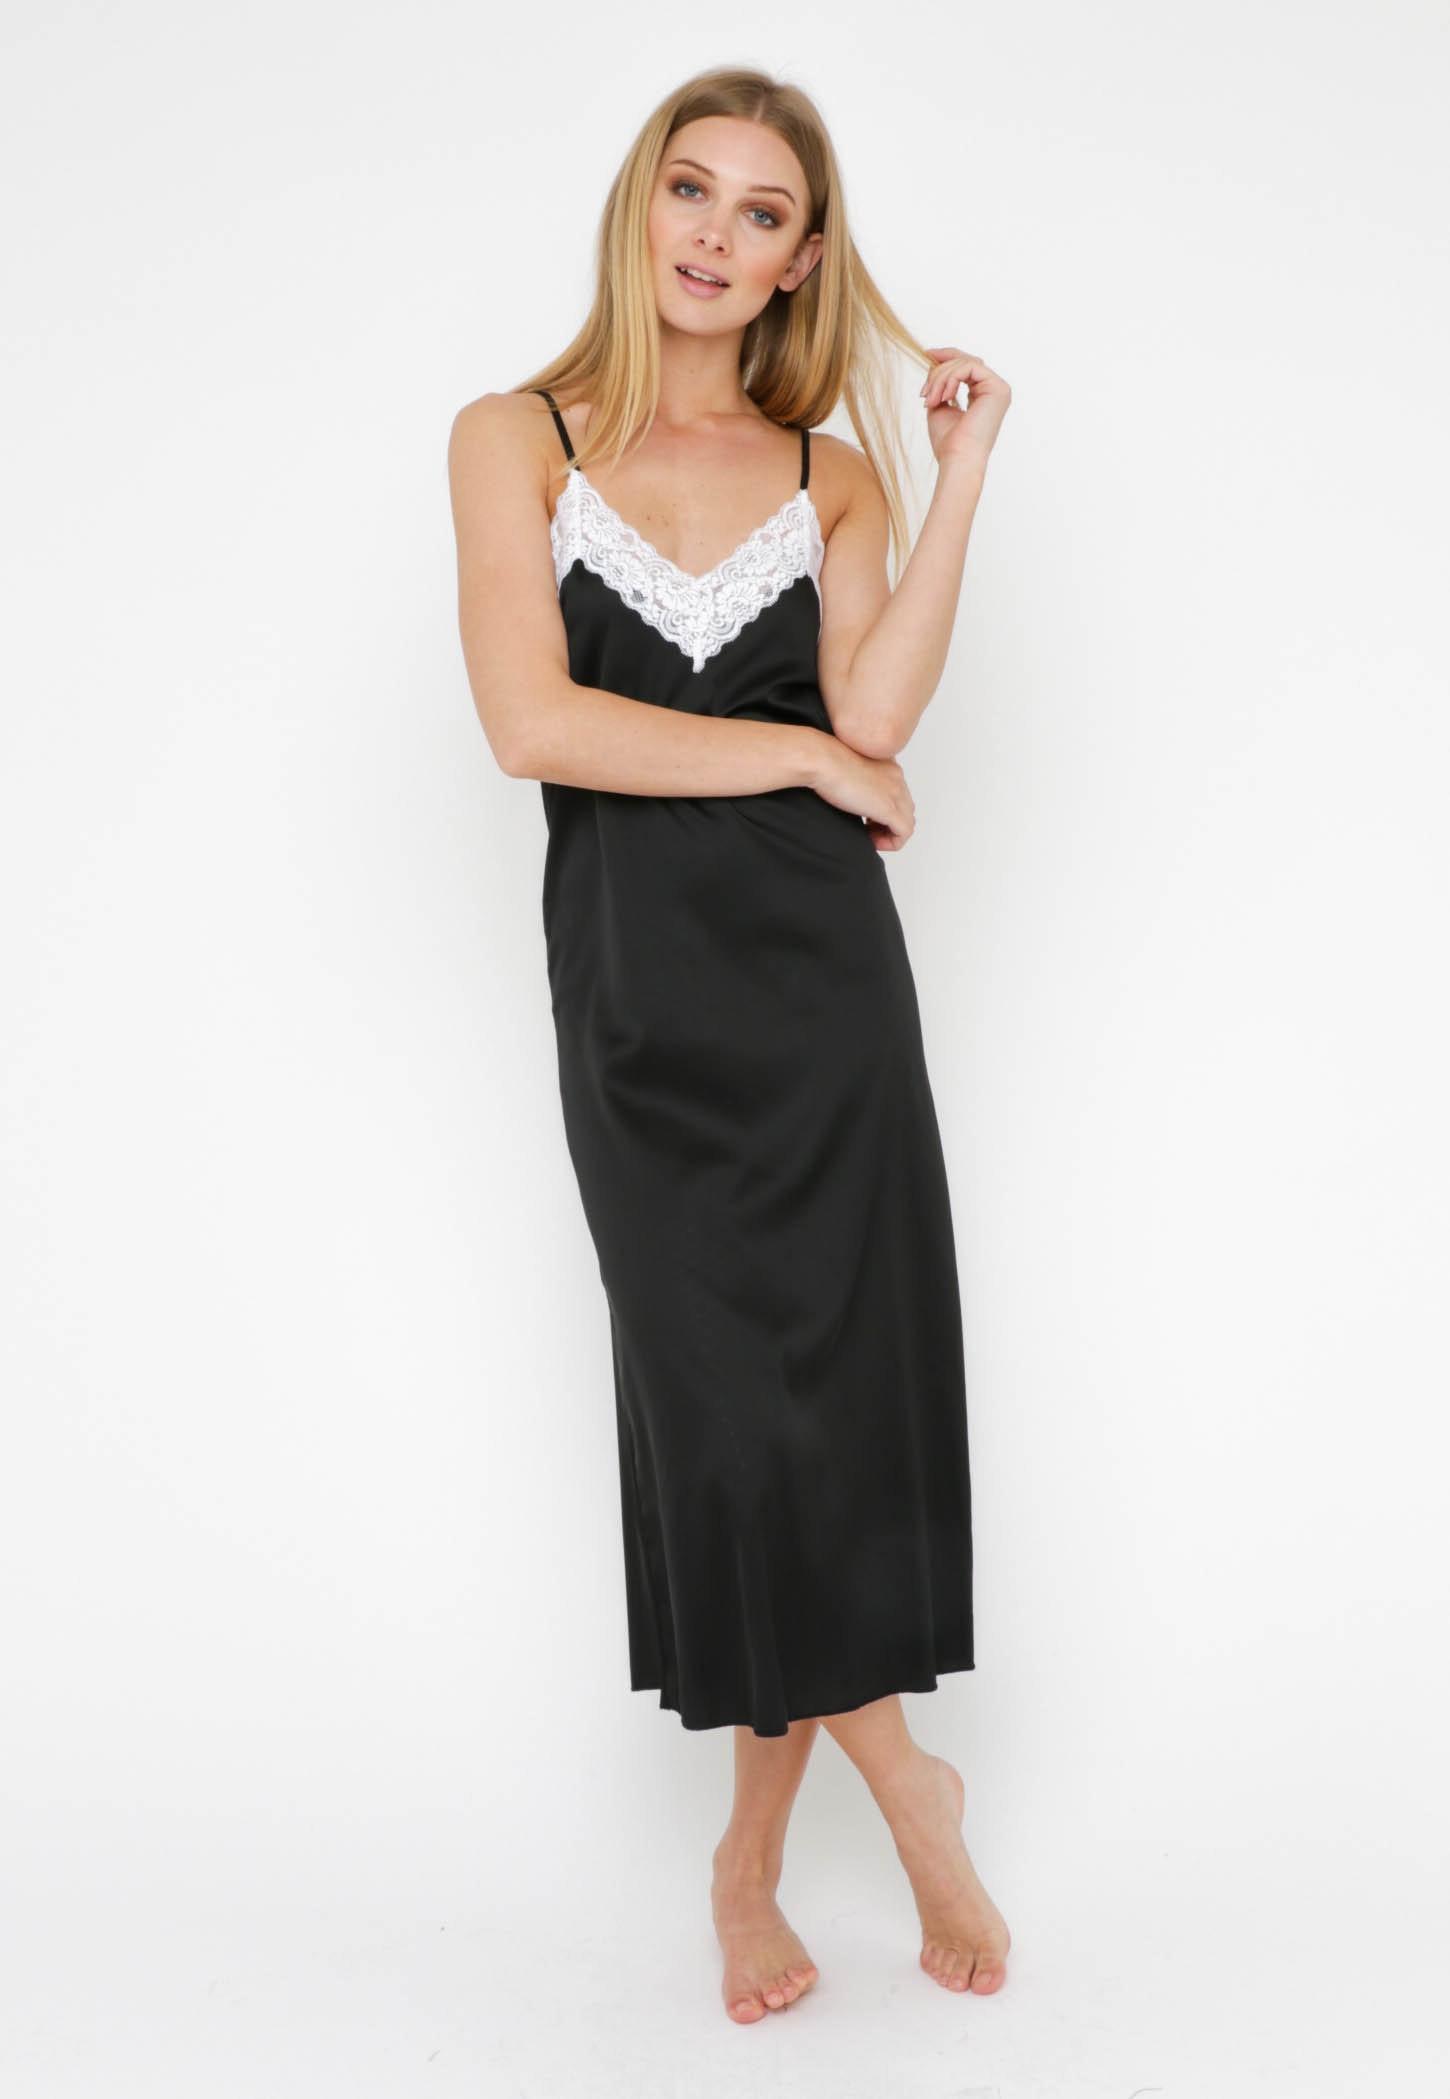 Anita Lace Midi Slip Dress - Black/White